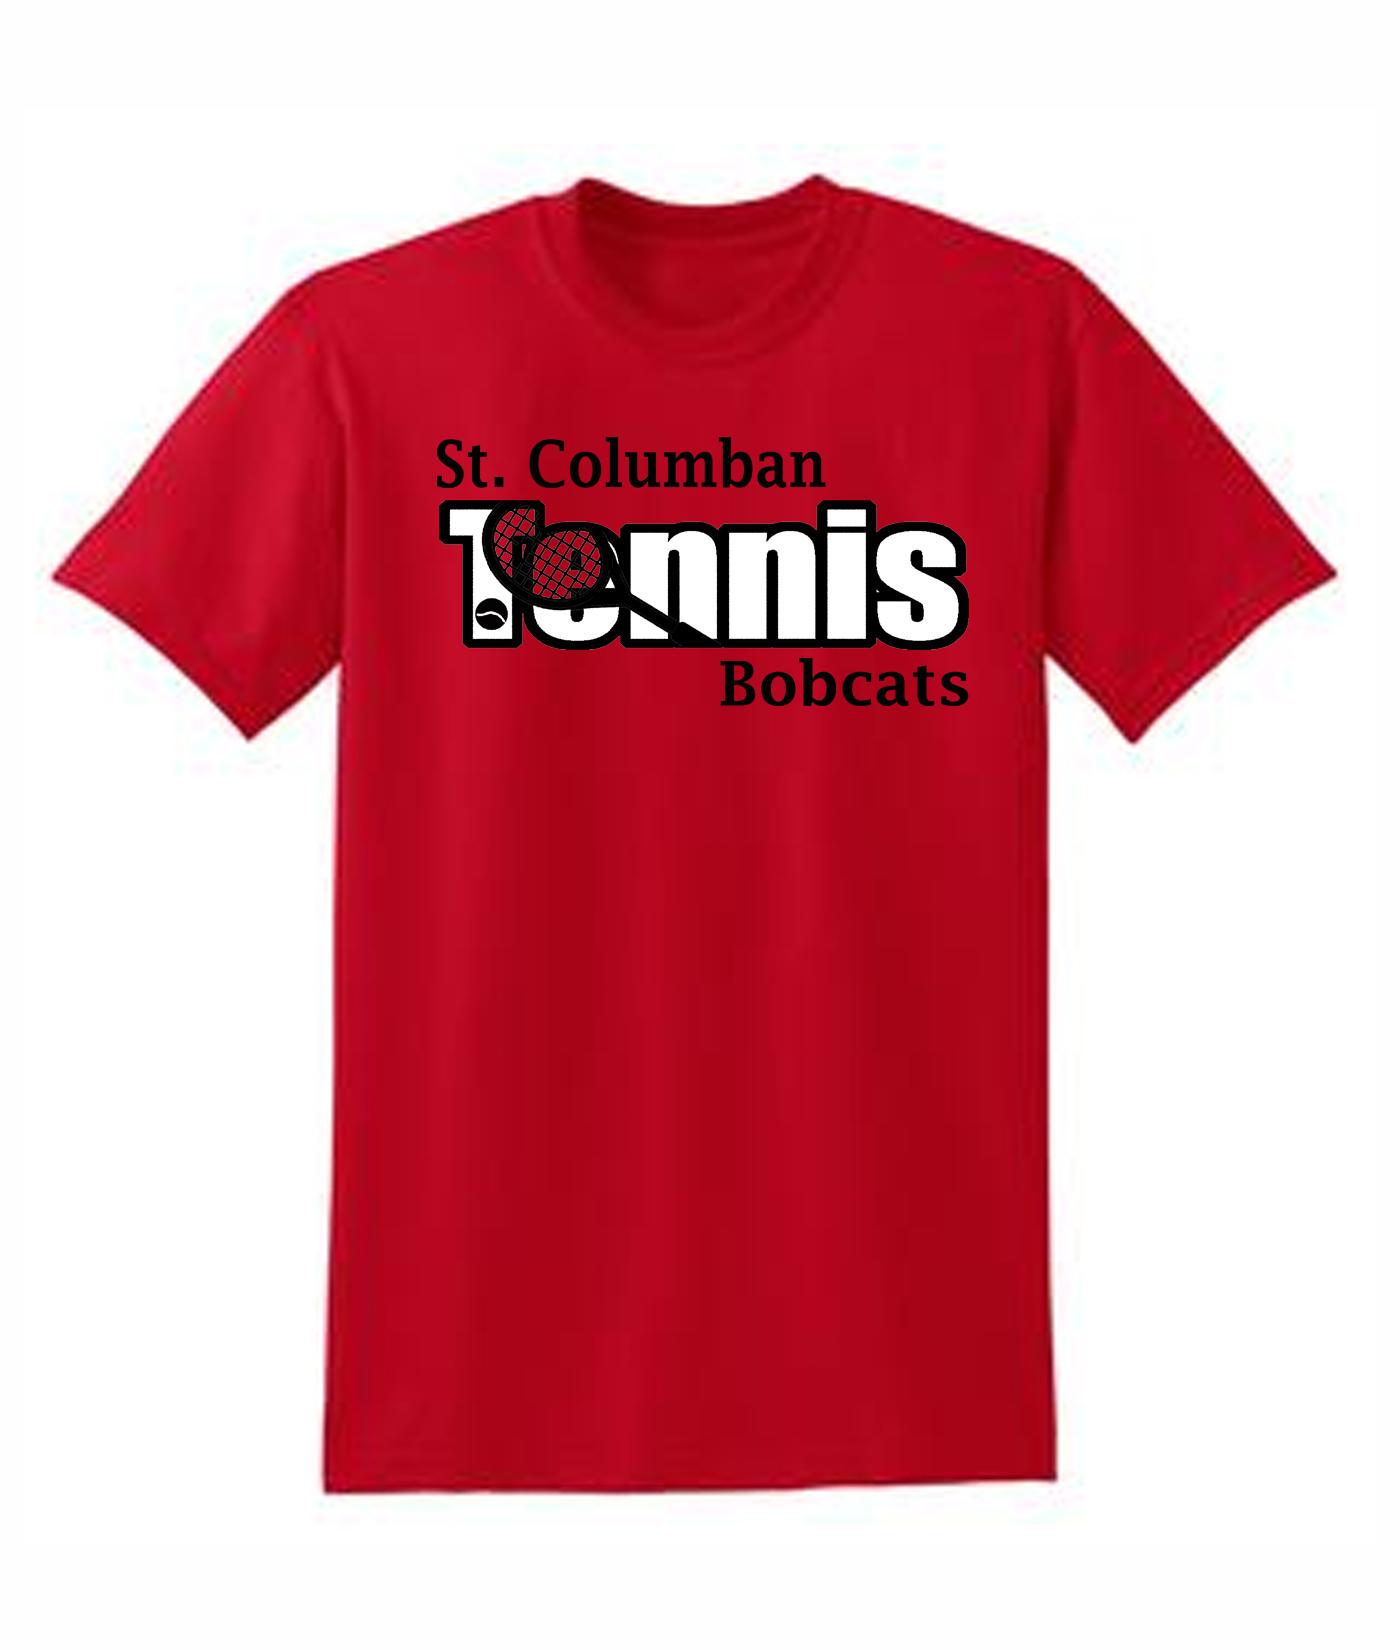 St. Columban Tennis Red T-Shirt